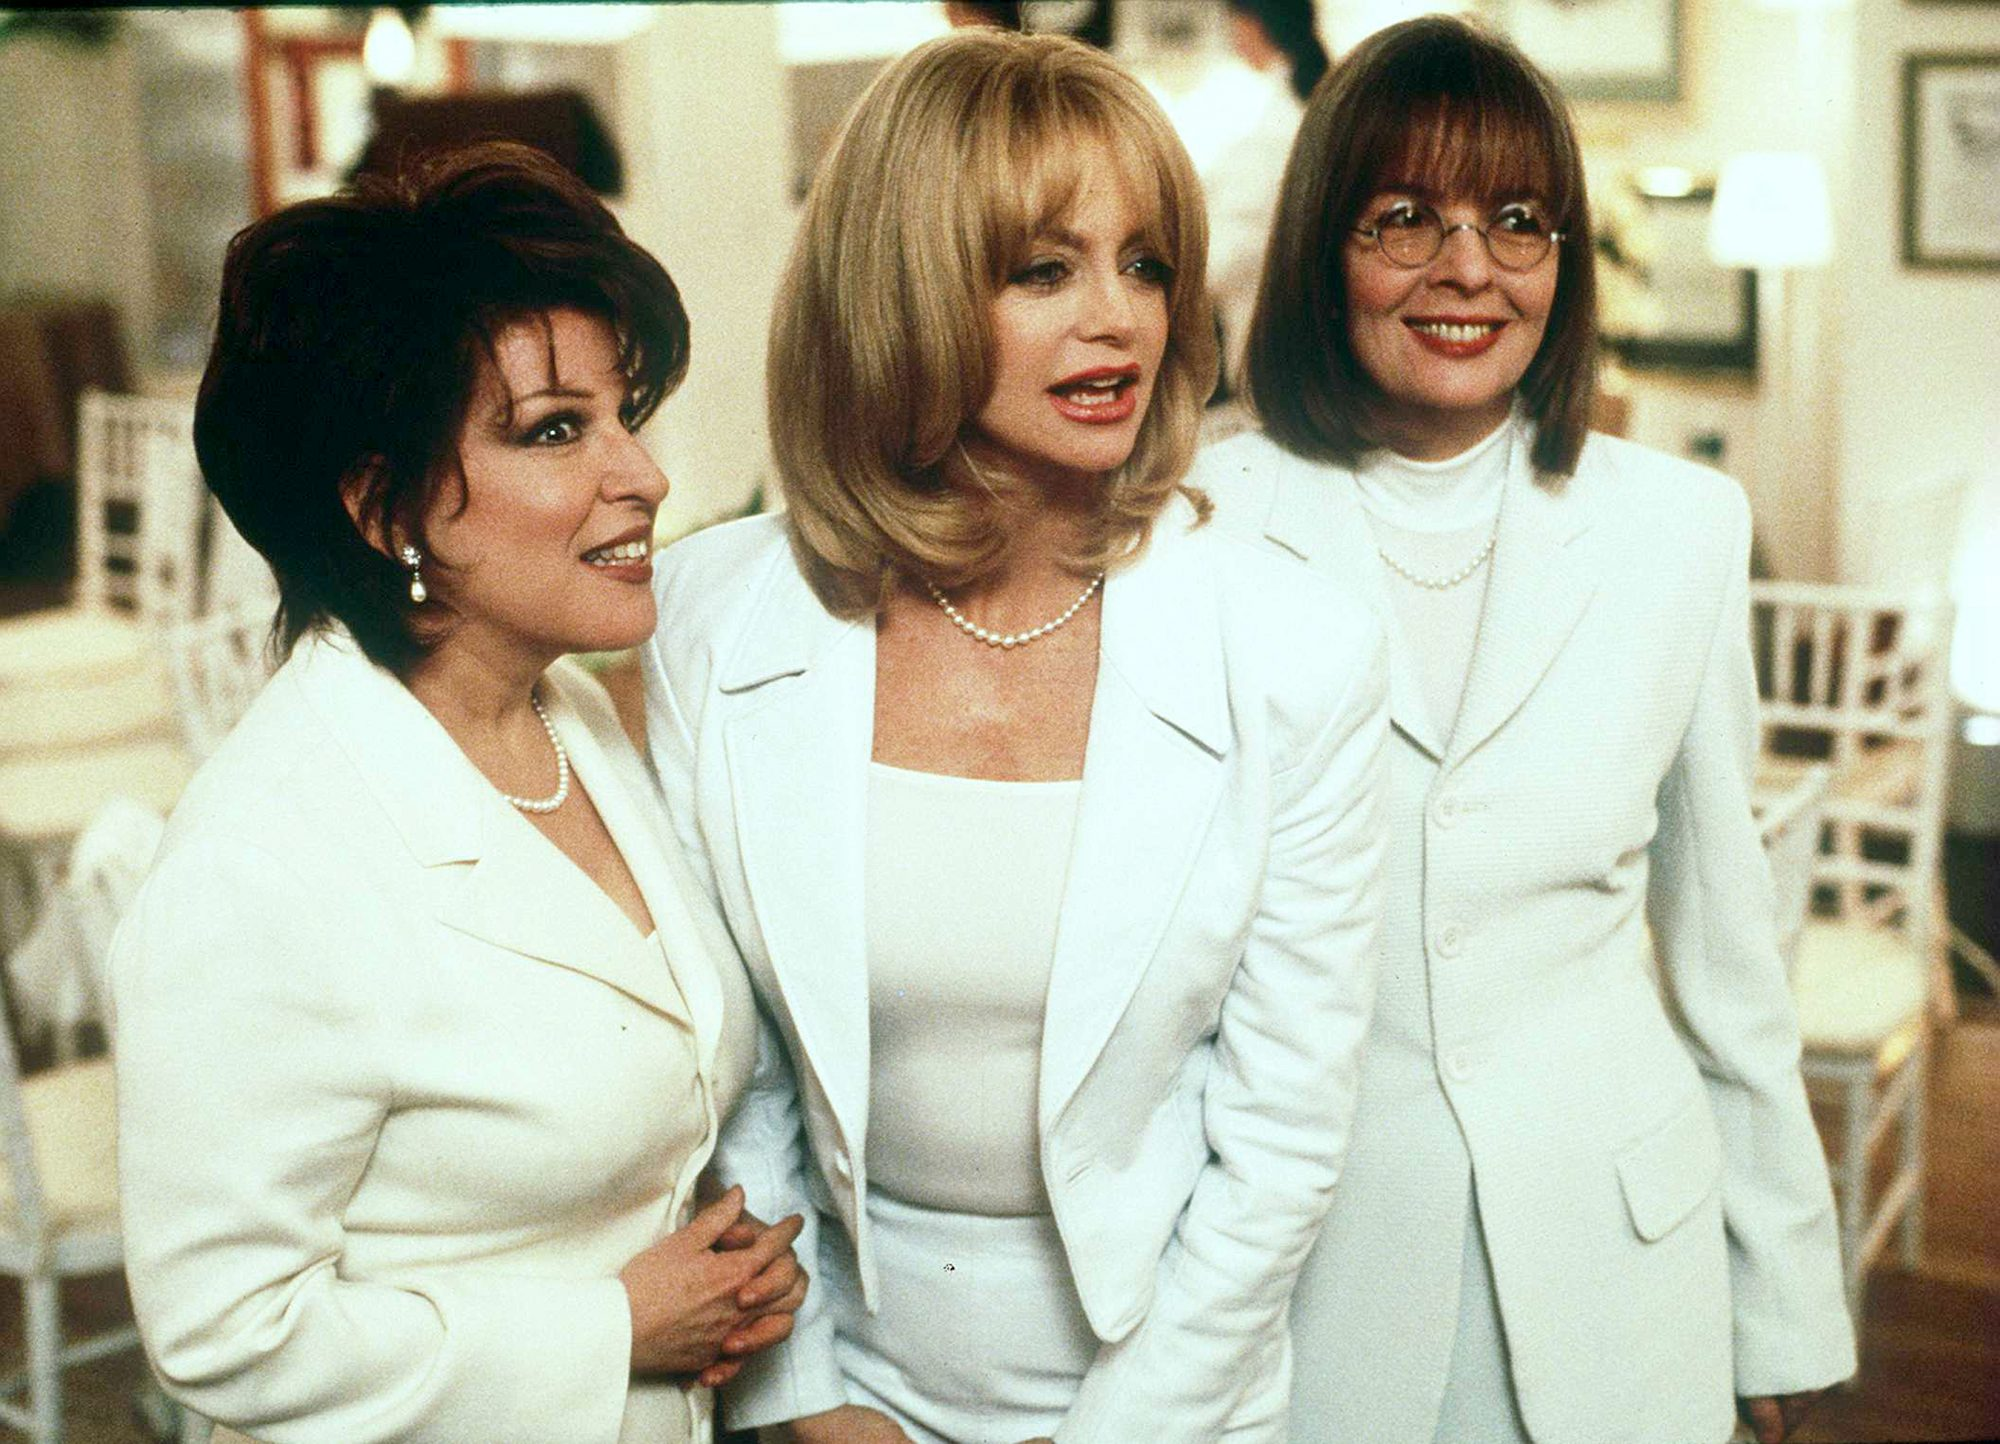 First Wives Club Beete Midler Goldie Hawn And Diane Keaton